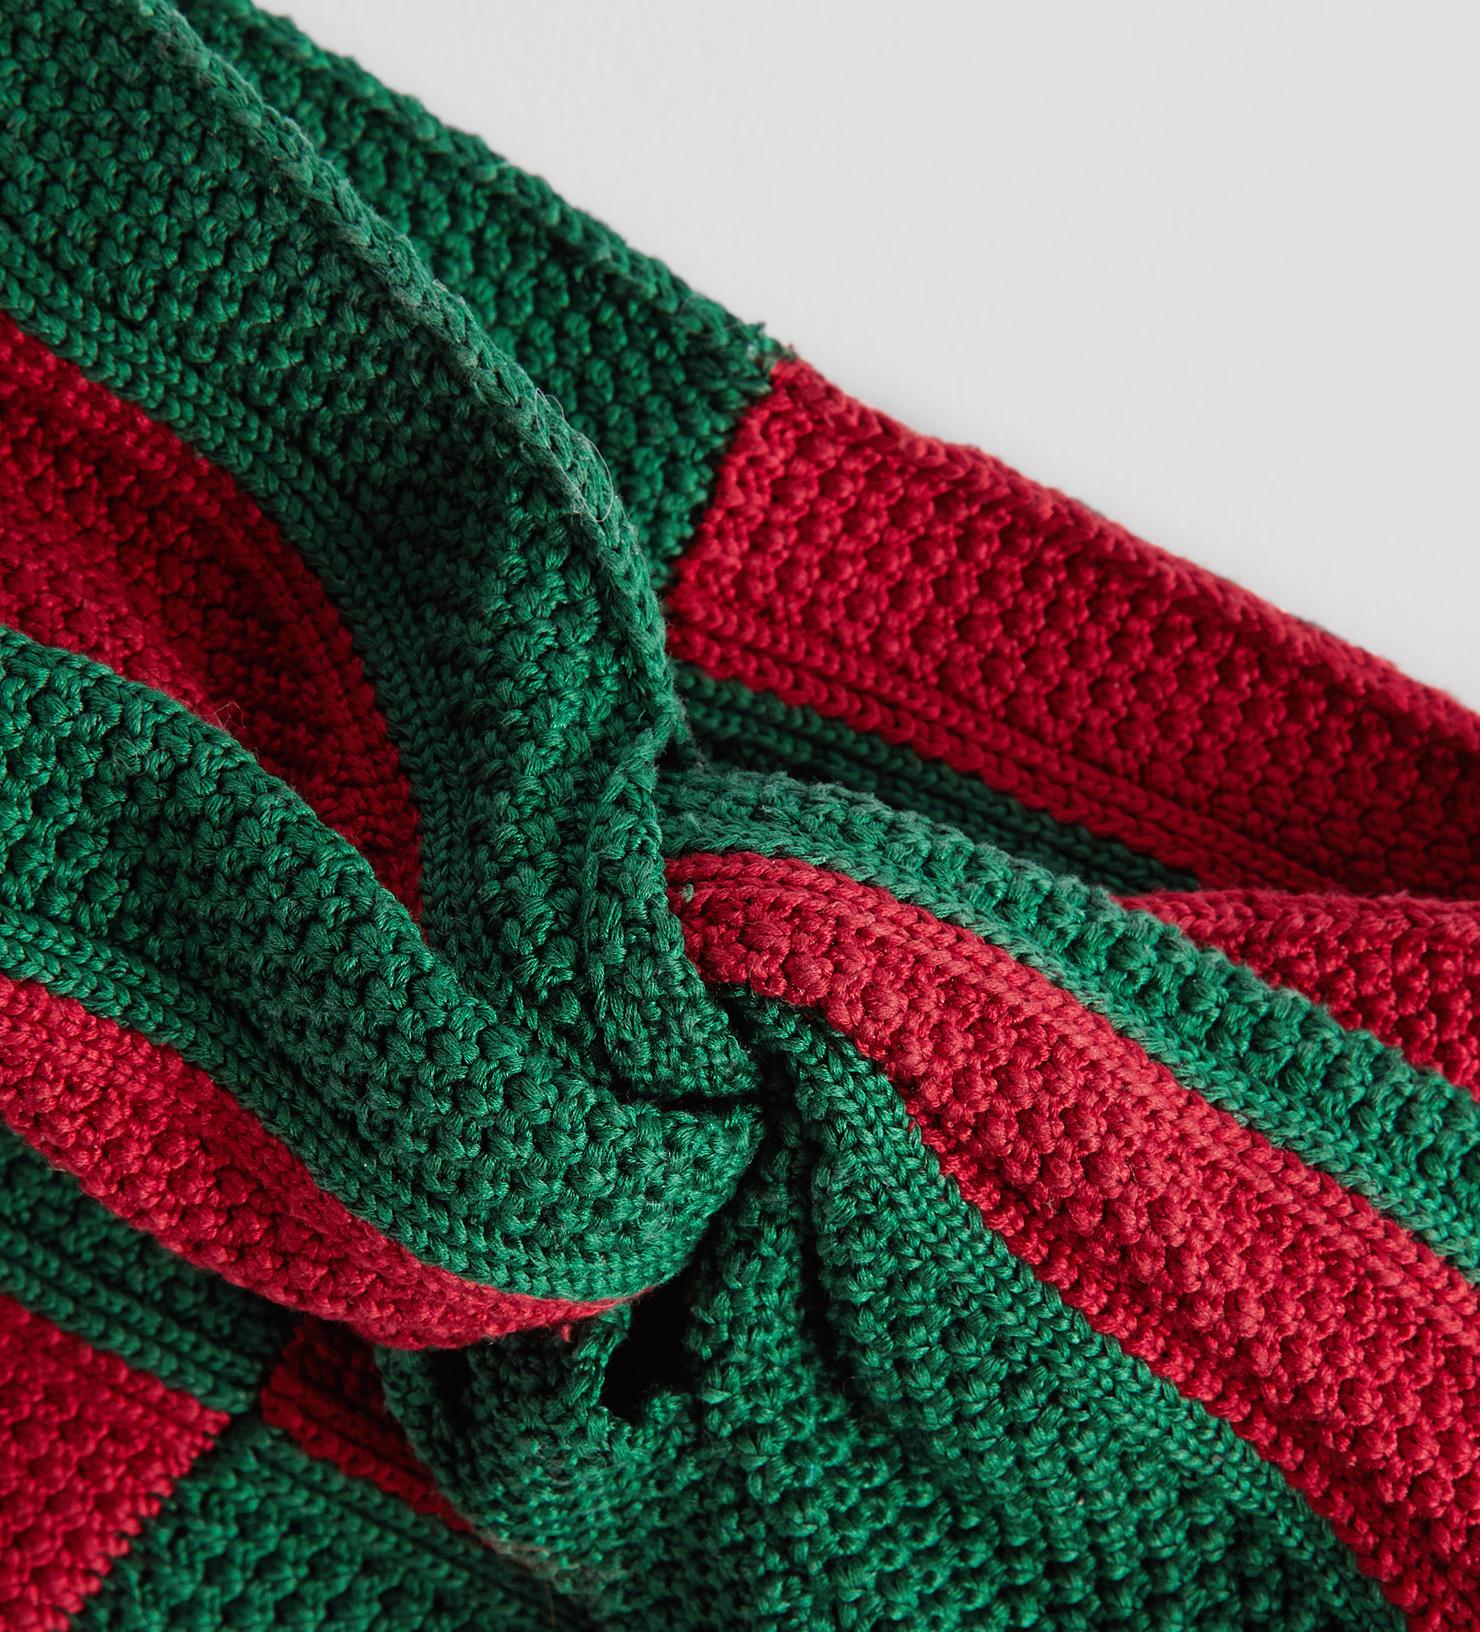 09a633c60a5 Gucci Web Cotton Headband in Green - Lyst